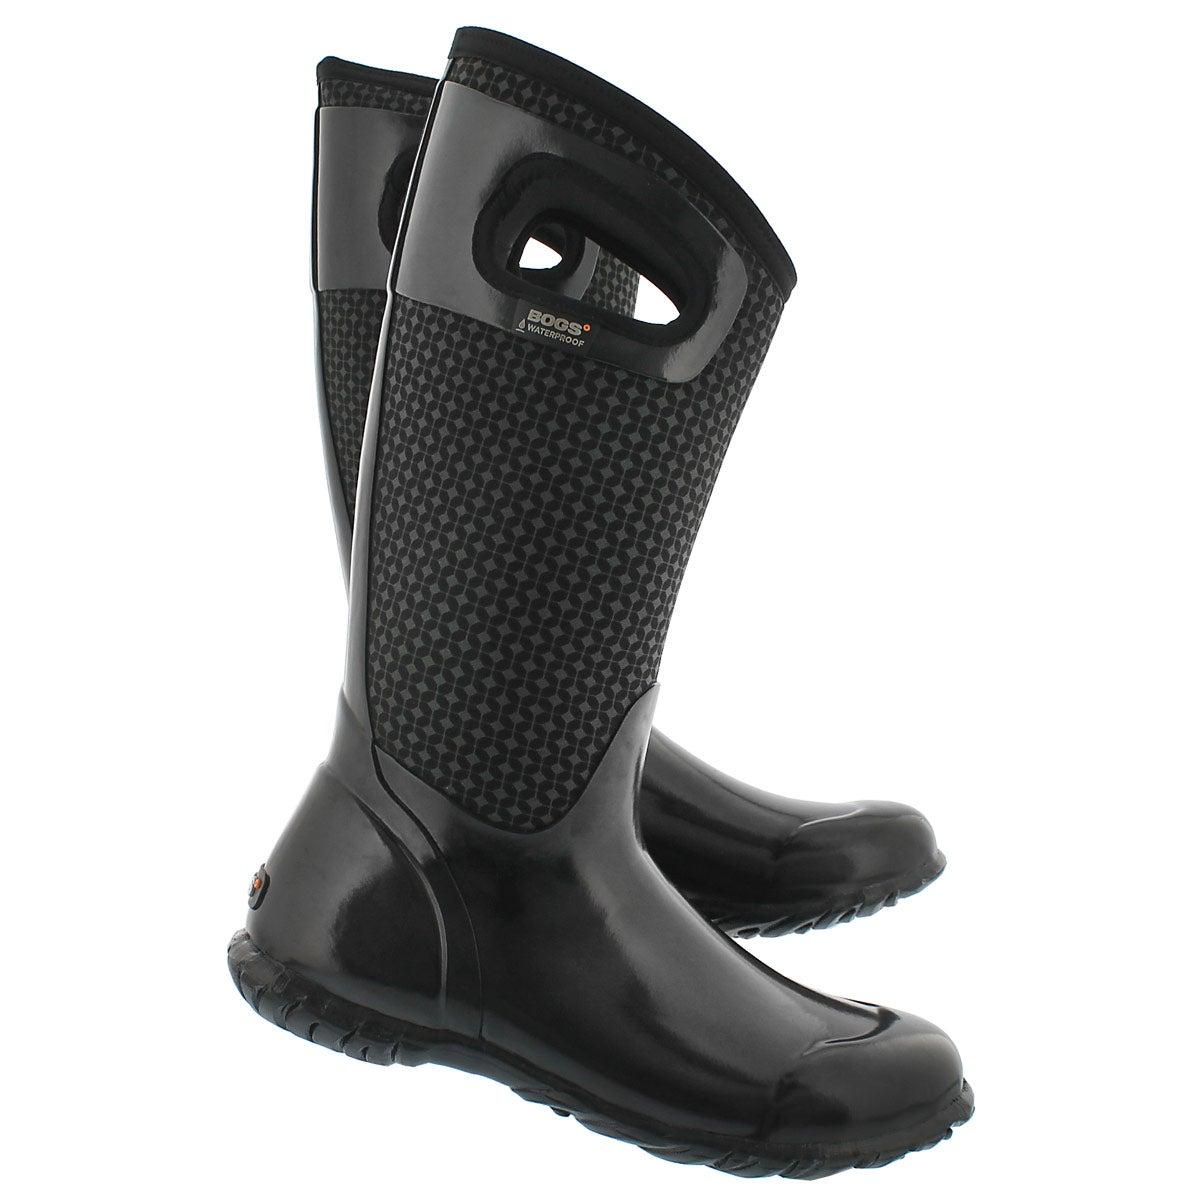 Lds NorthHamptonCravat blk wtpf boot